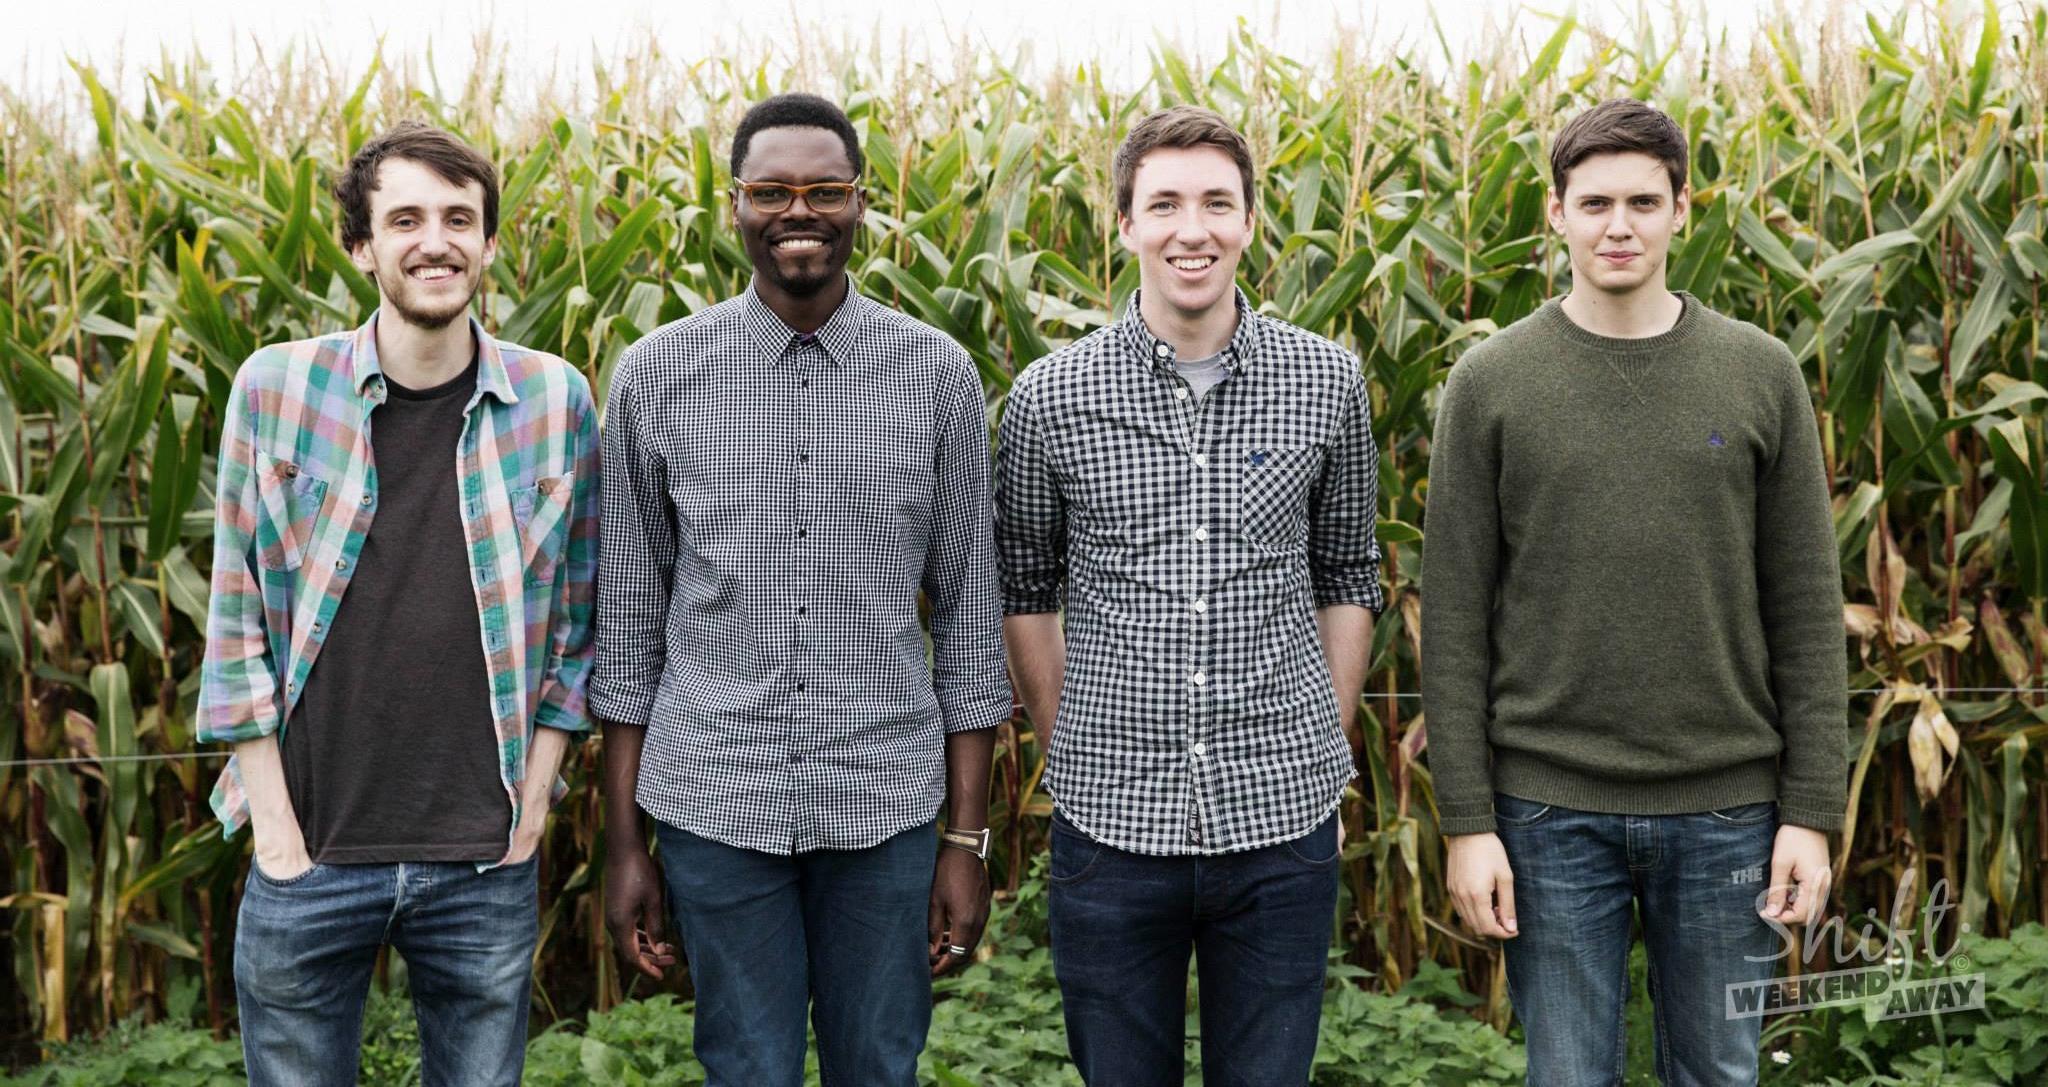 from left: Nathan Stirling, Kelani Koyejo, Jonathan Ogden, and David Hailes